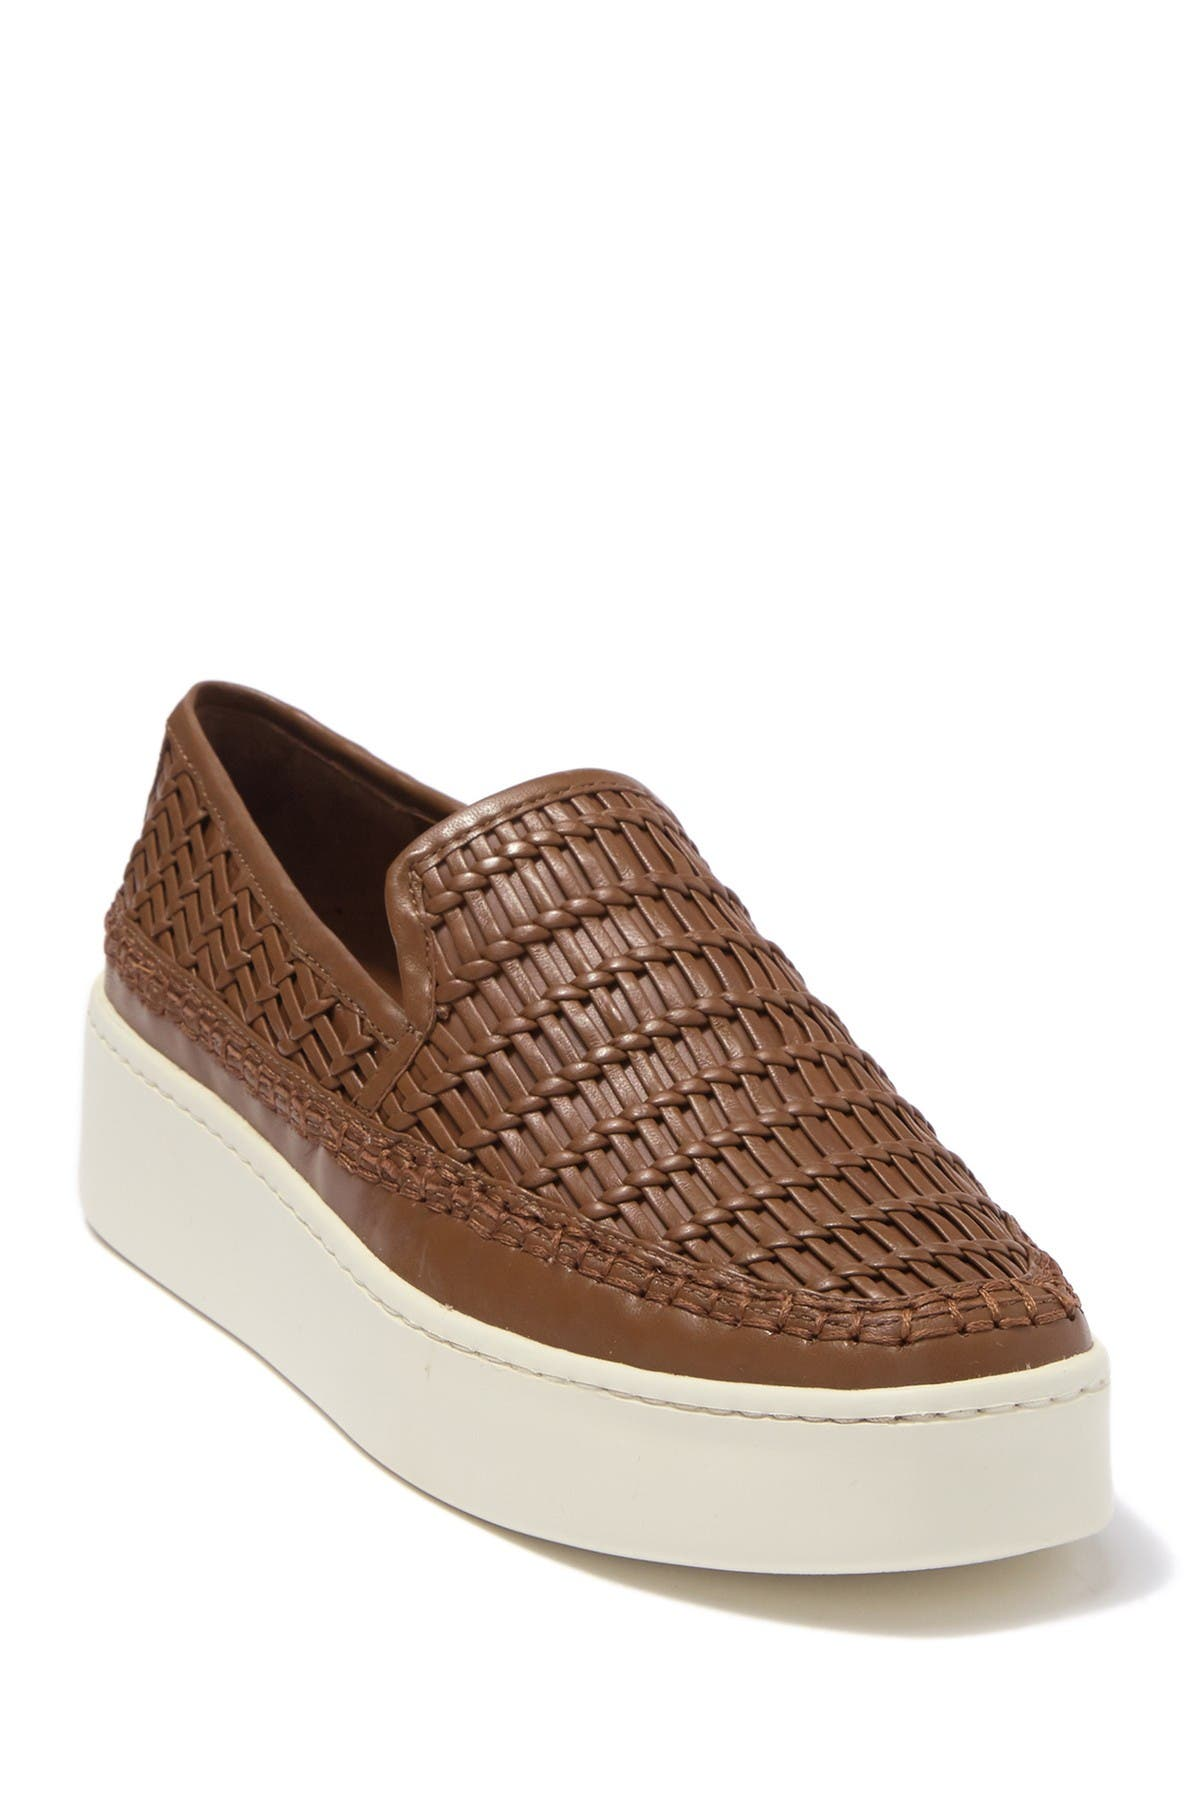 Vince   Stafford Sneaker   HauteLook